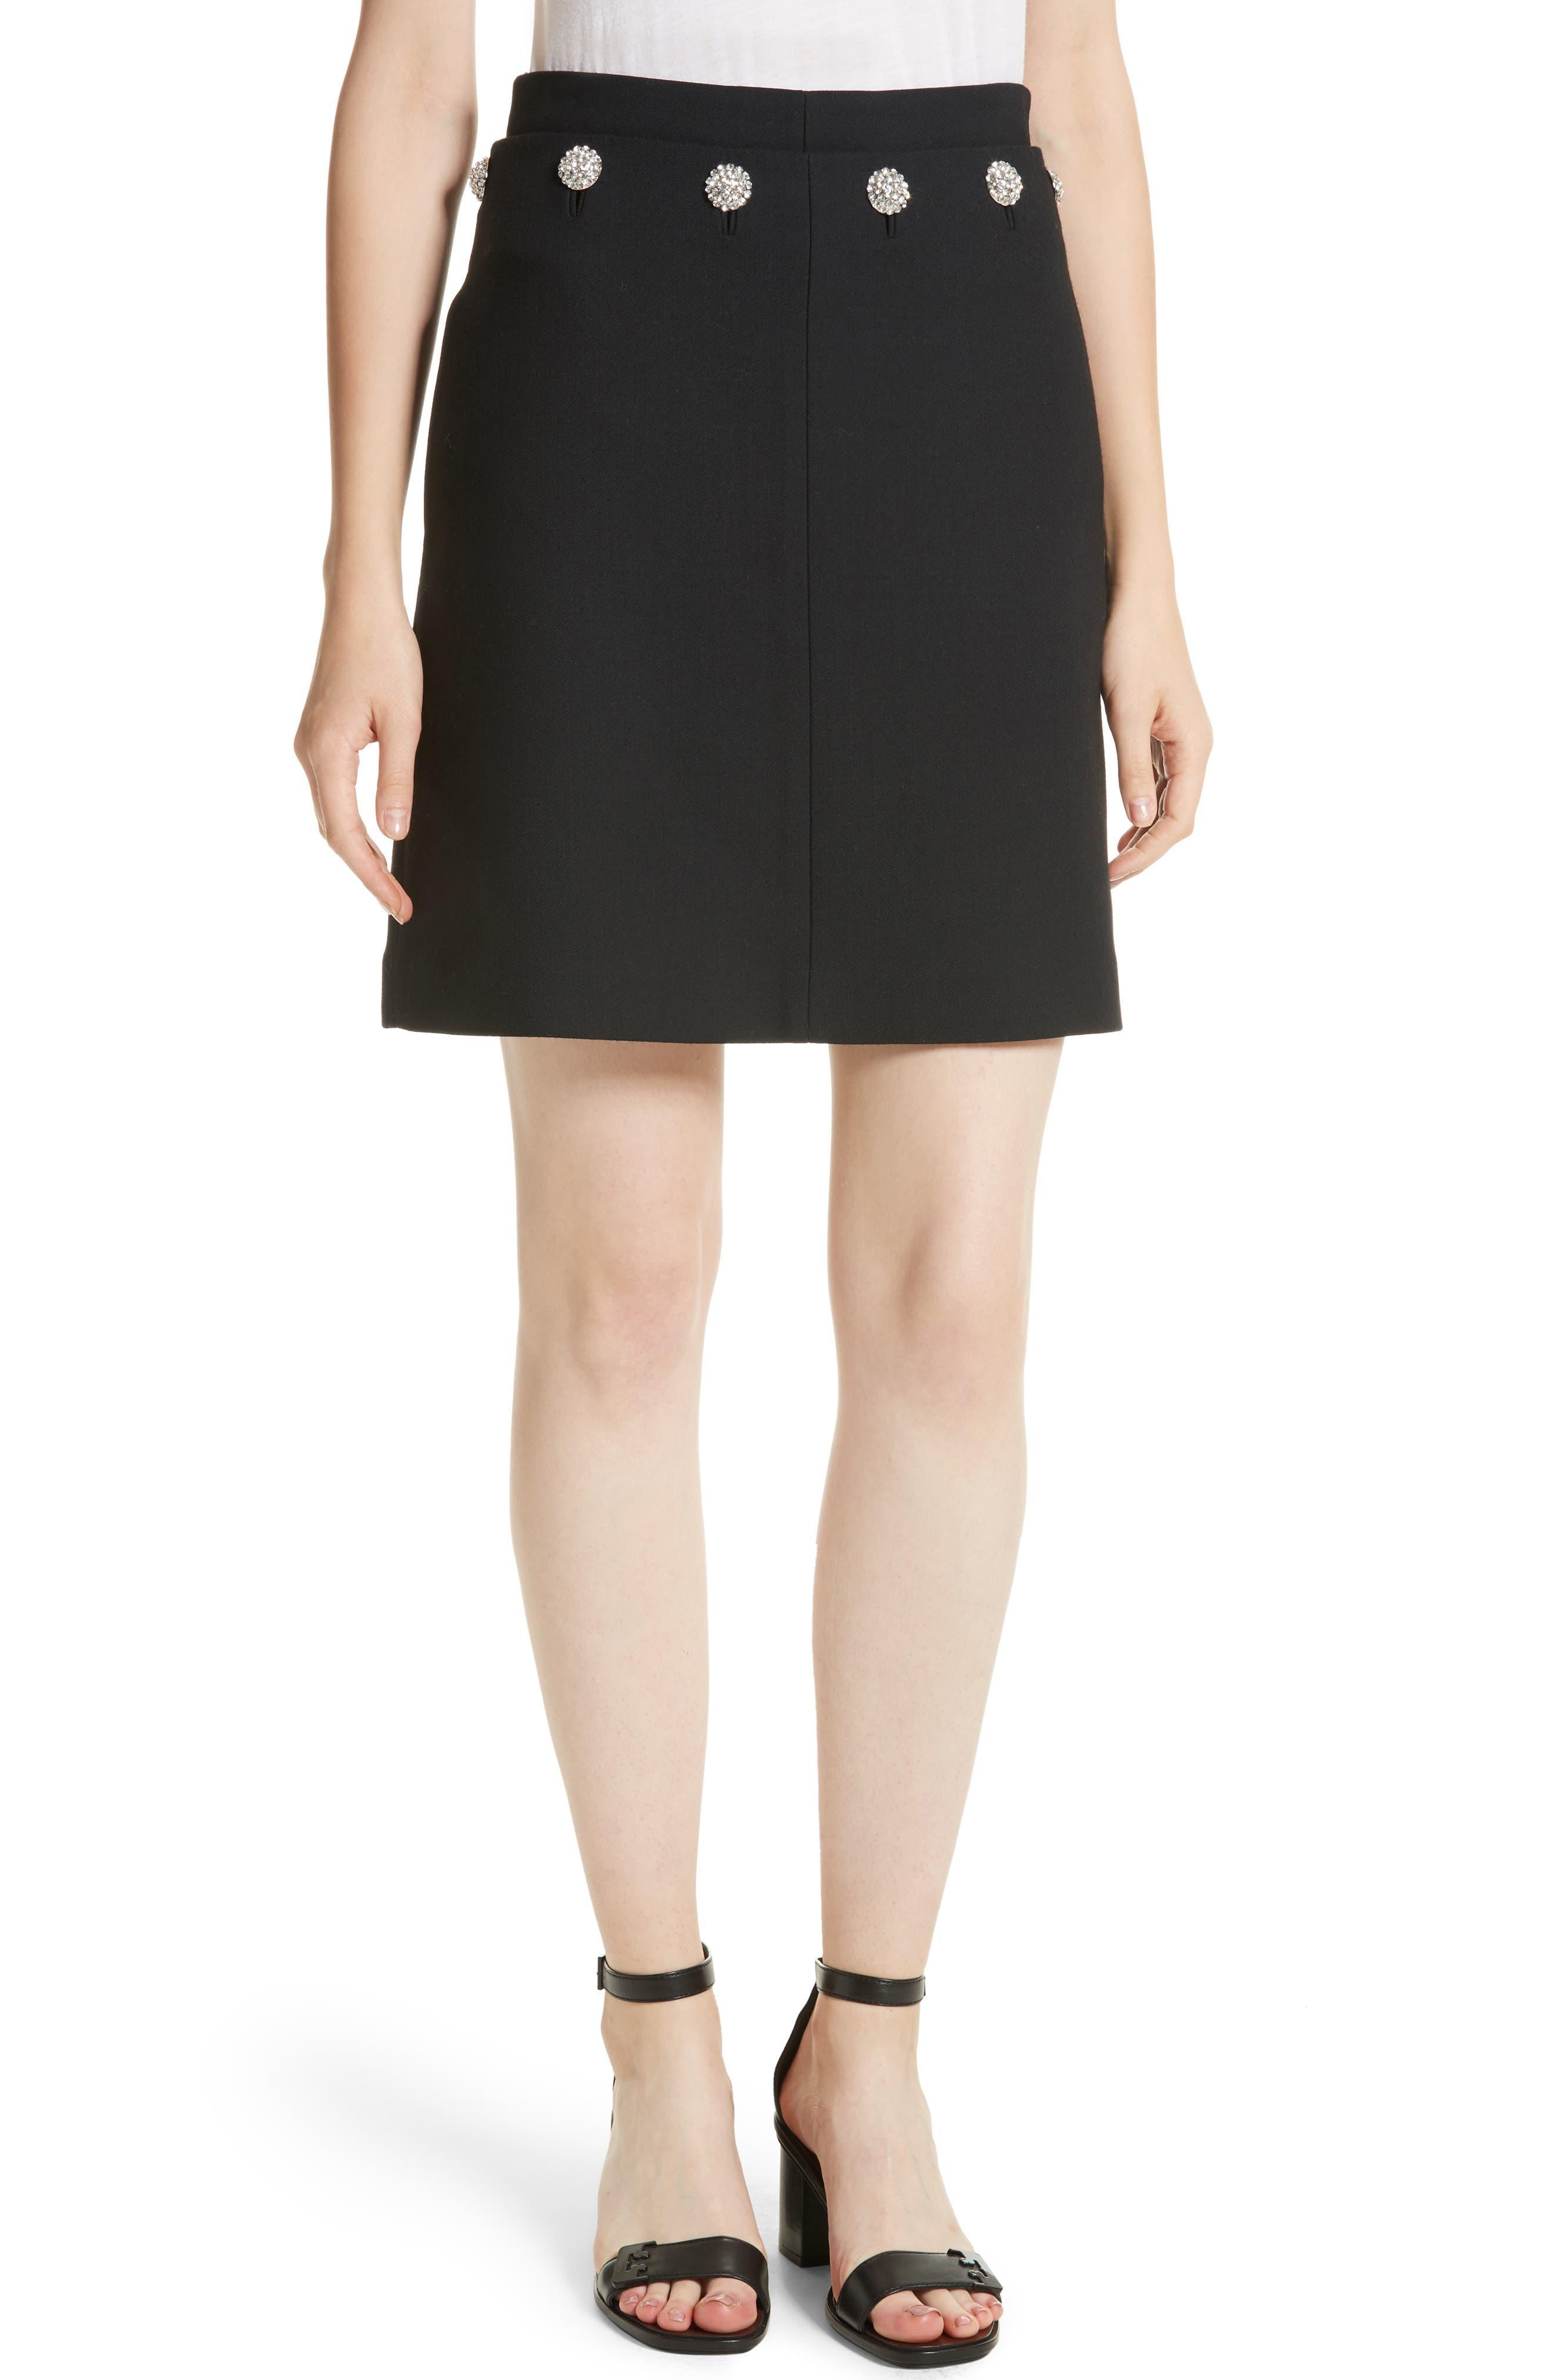 Tory Burch Fremont Embellished A-Line Skirt